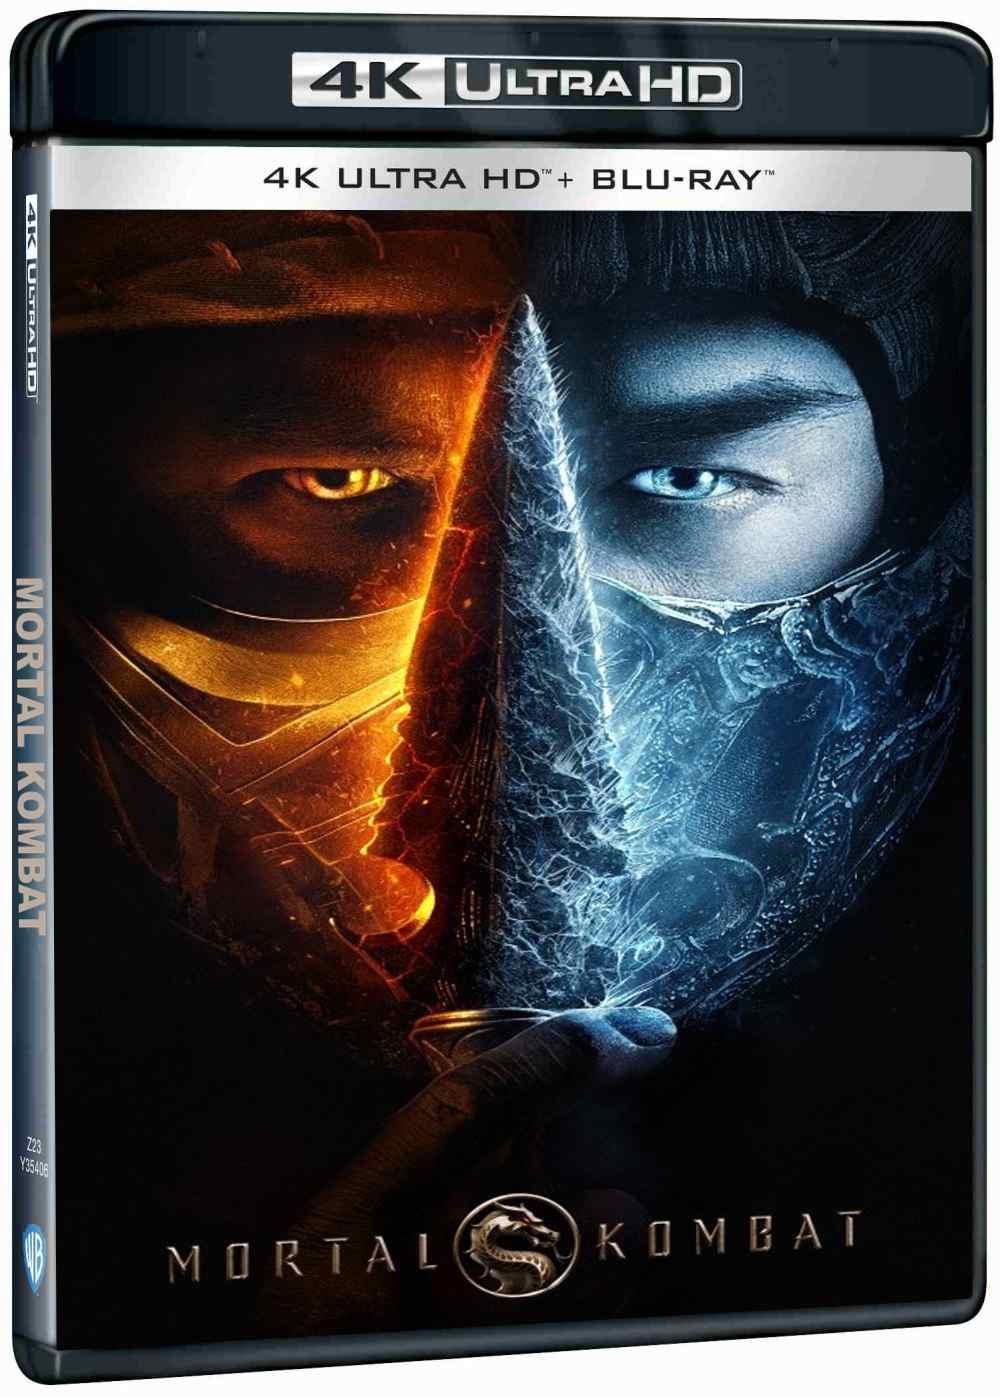 Mortal Kombat - 4K UHD Blu-ray + Blu-ray (2 BD)